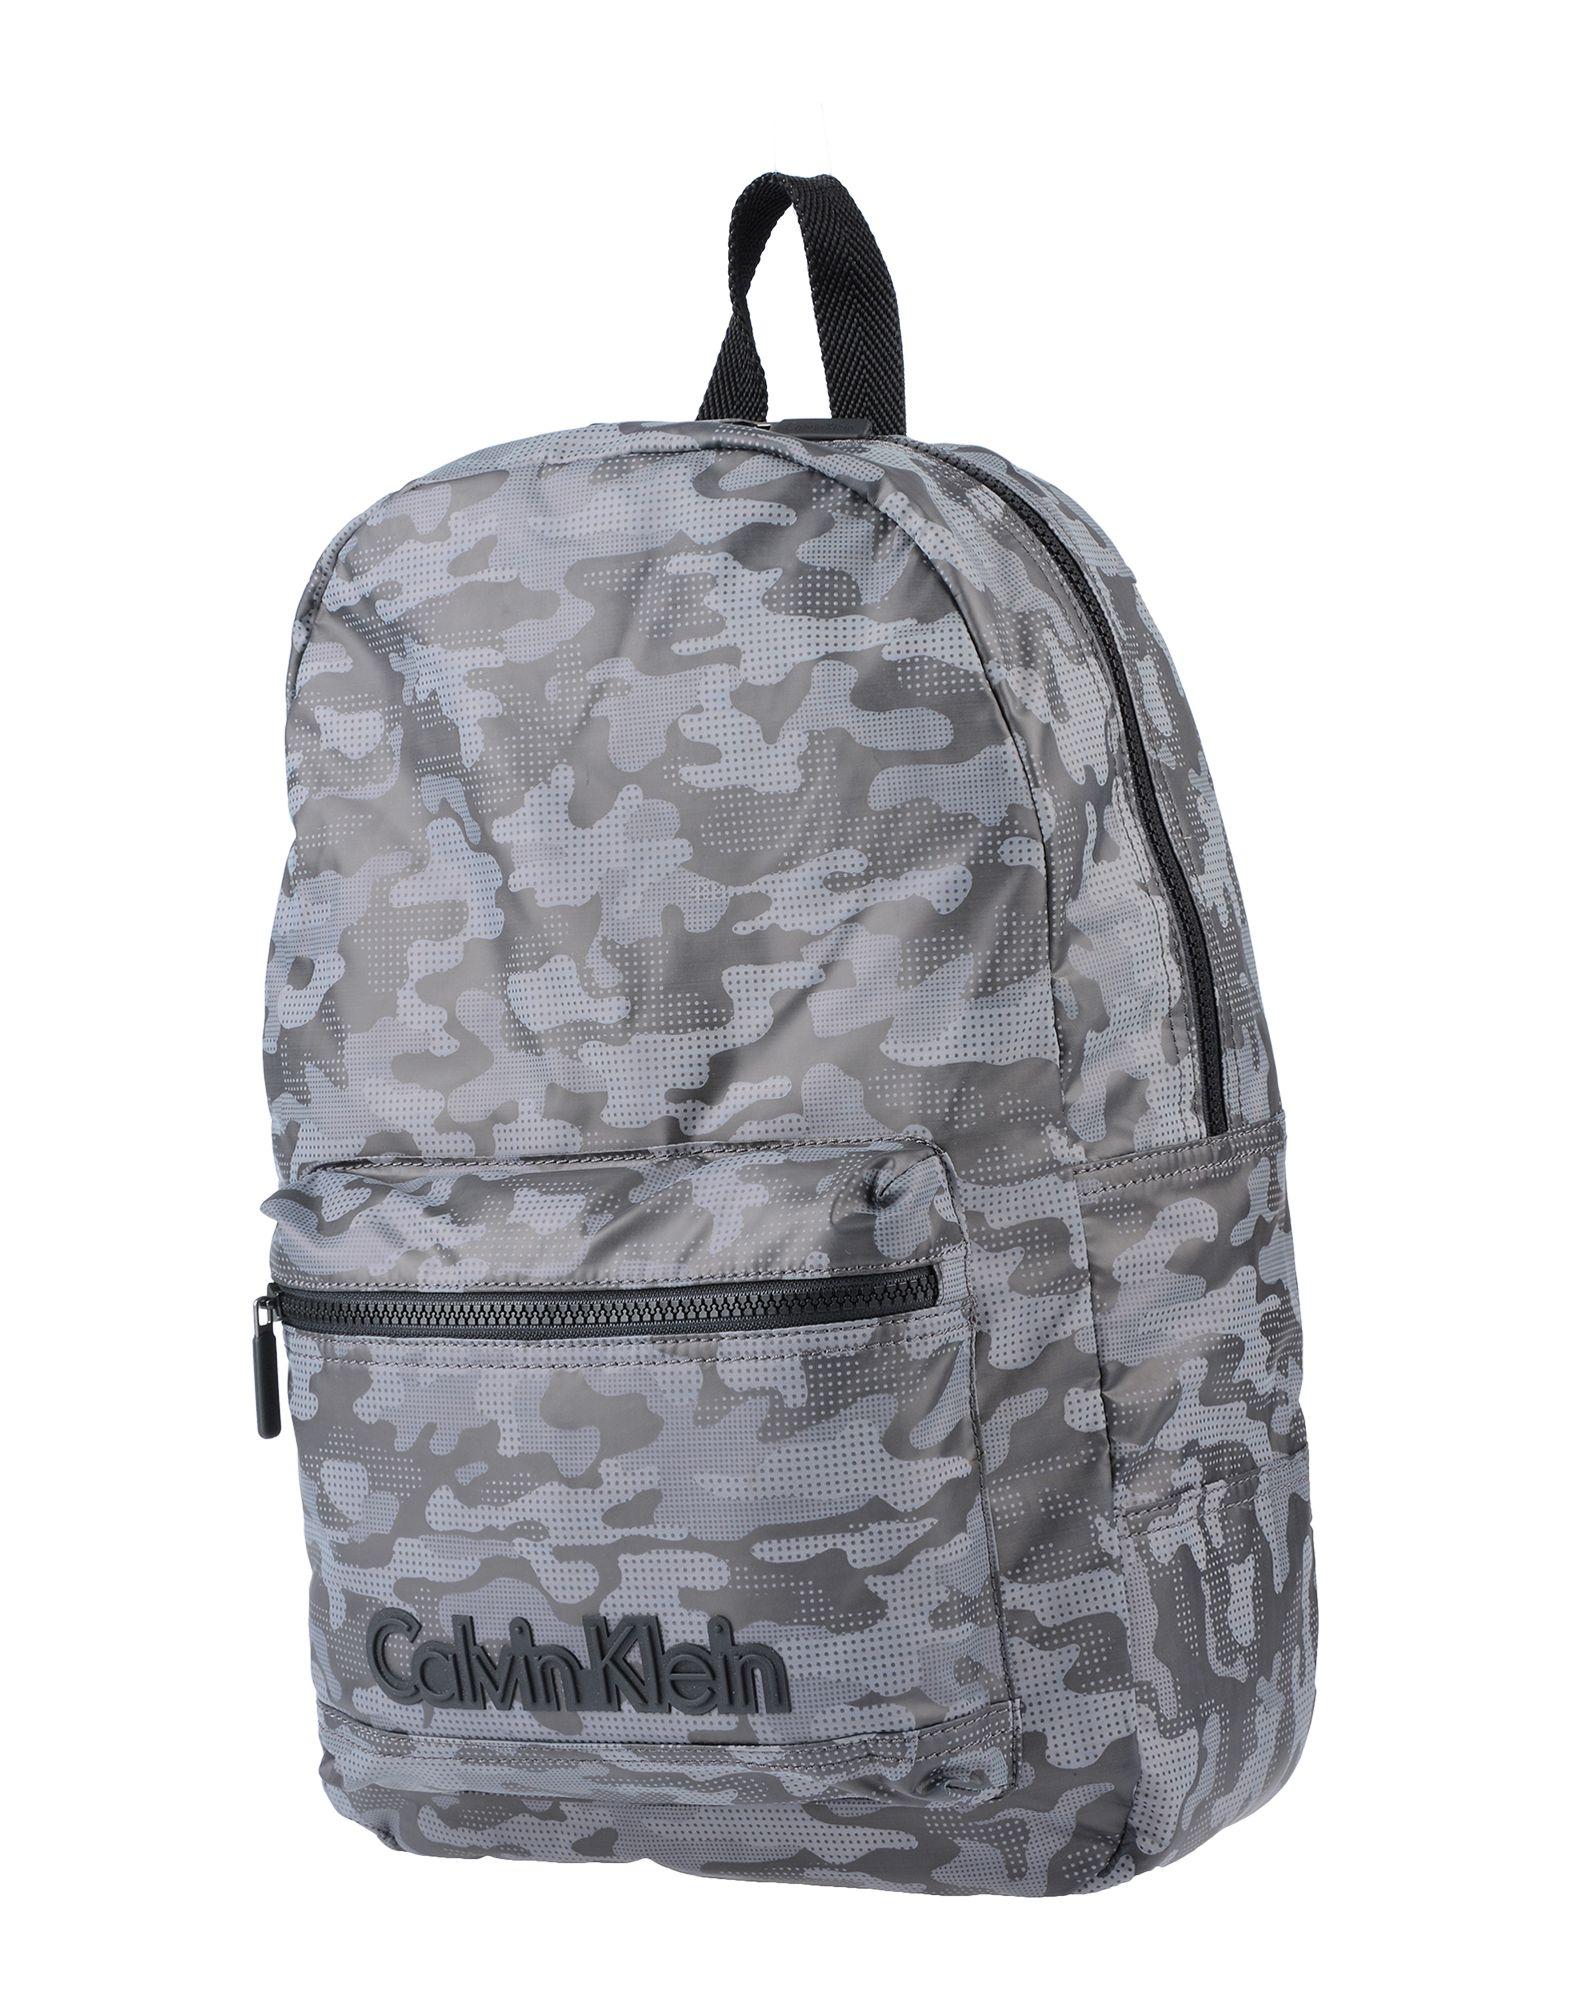 купить CALVIN KLEIN JEANS Рюкзаки и сумки на пояс по цене 5150 рублей